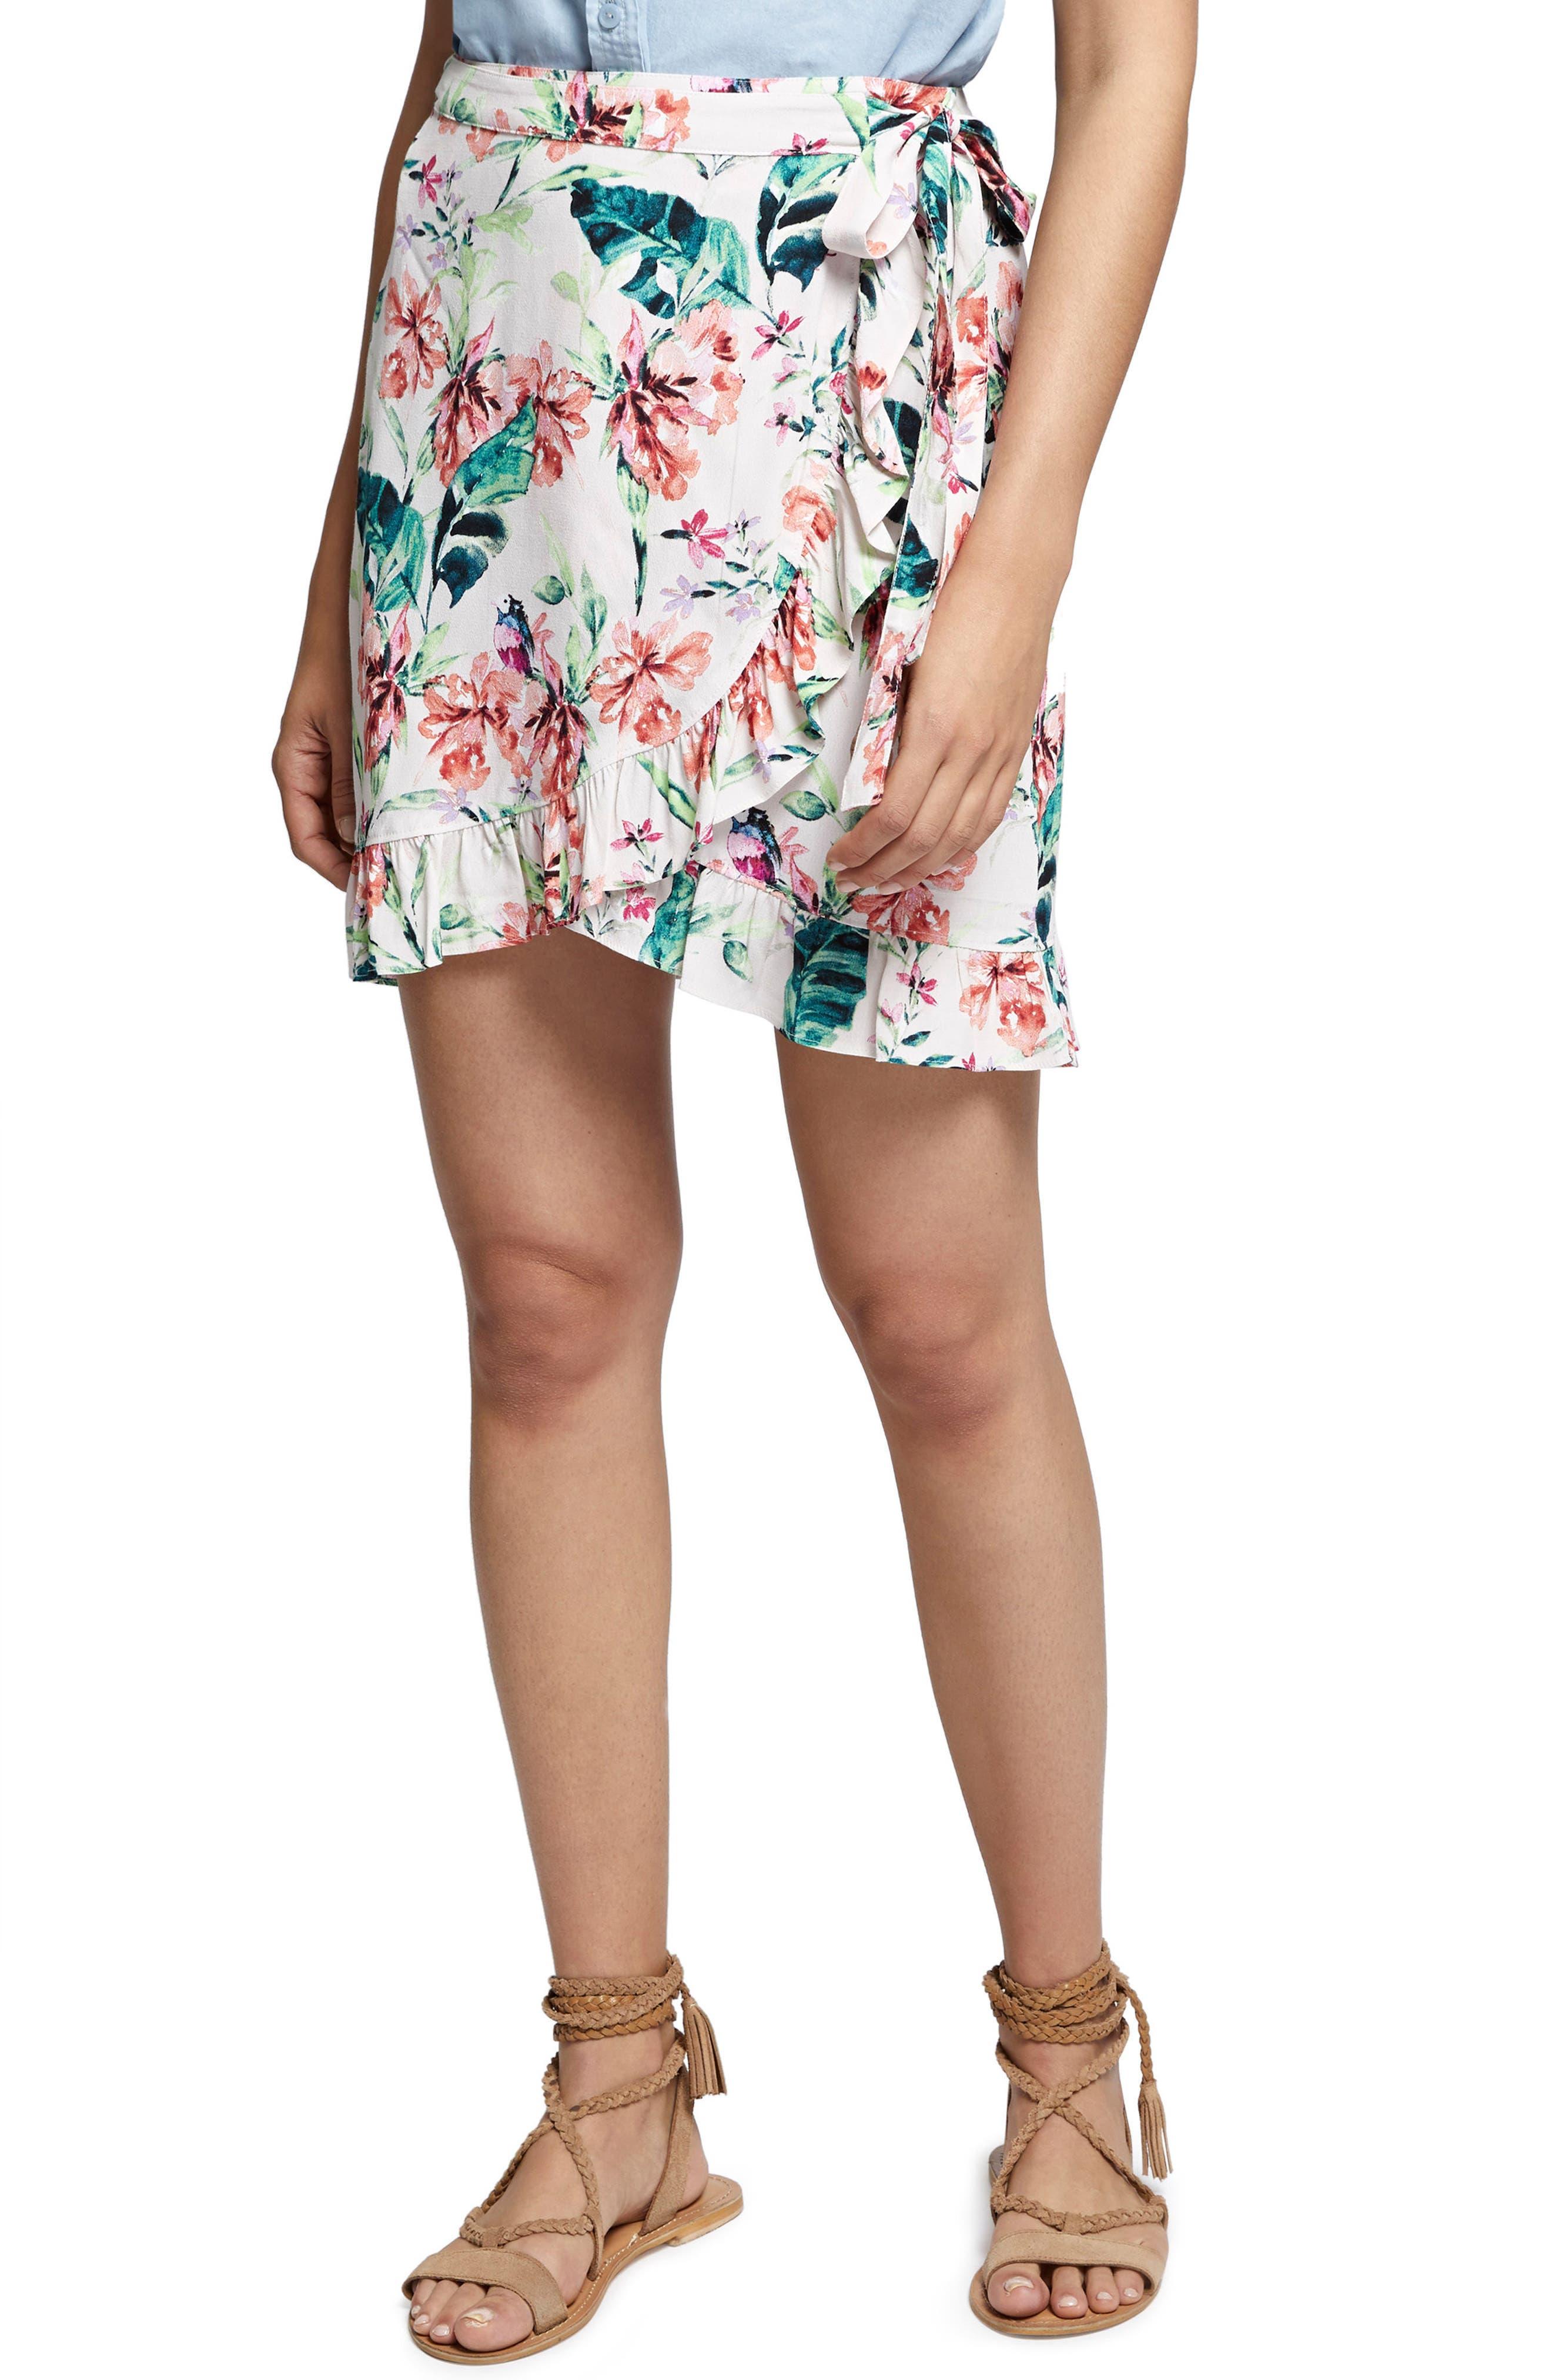 Tropicana Side Tie Ruffle Skirt,                             Main thumbnail 1, color,                             956